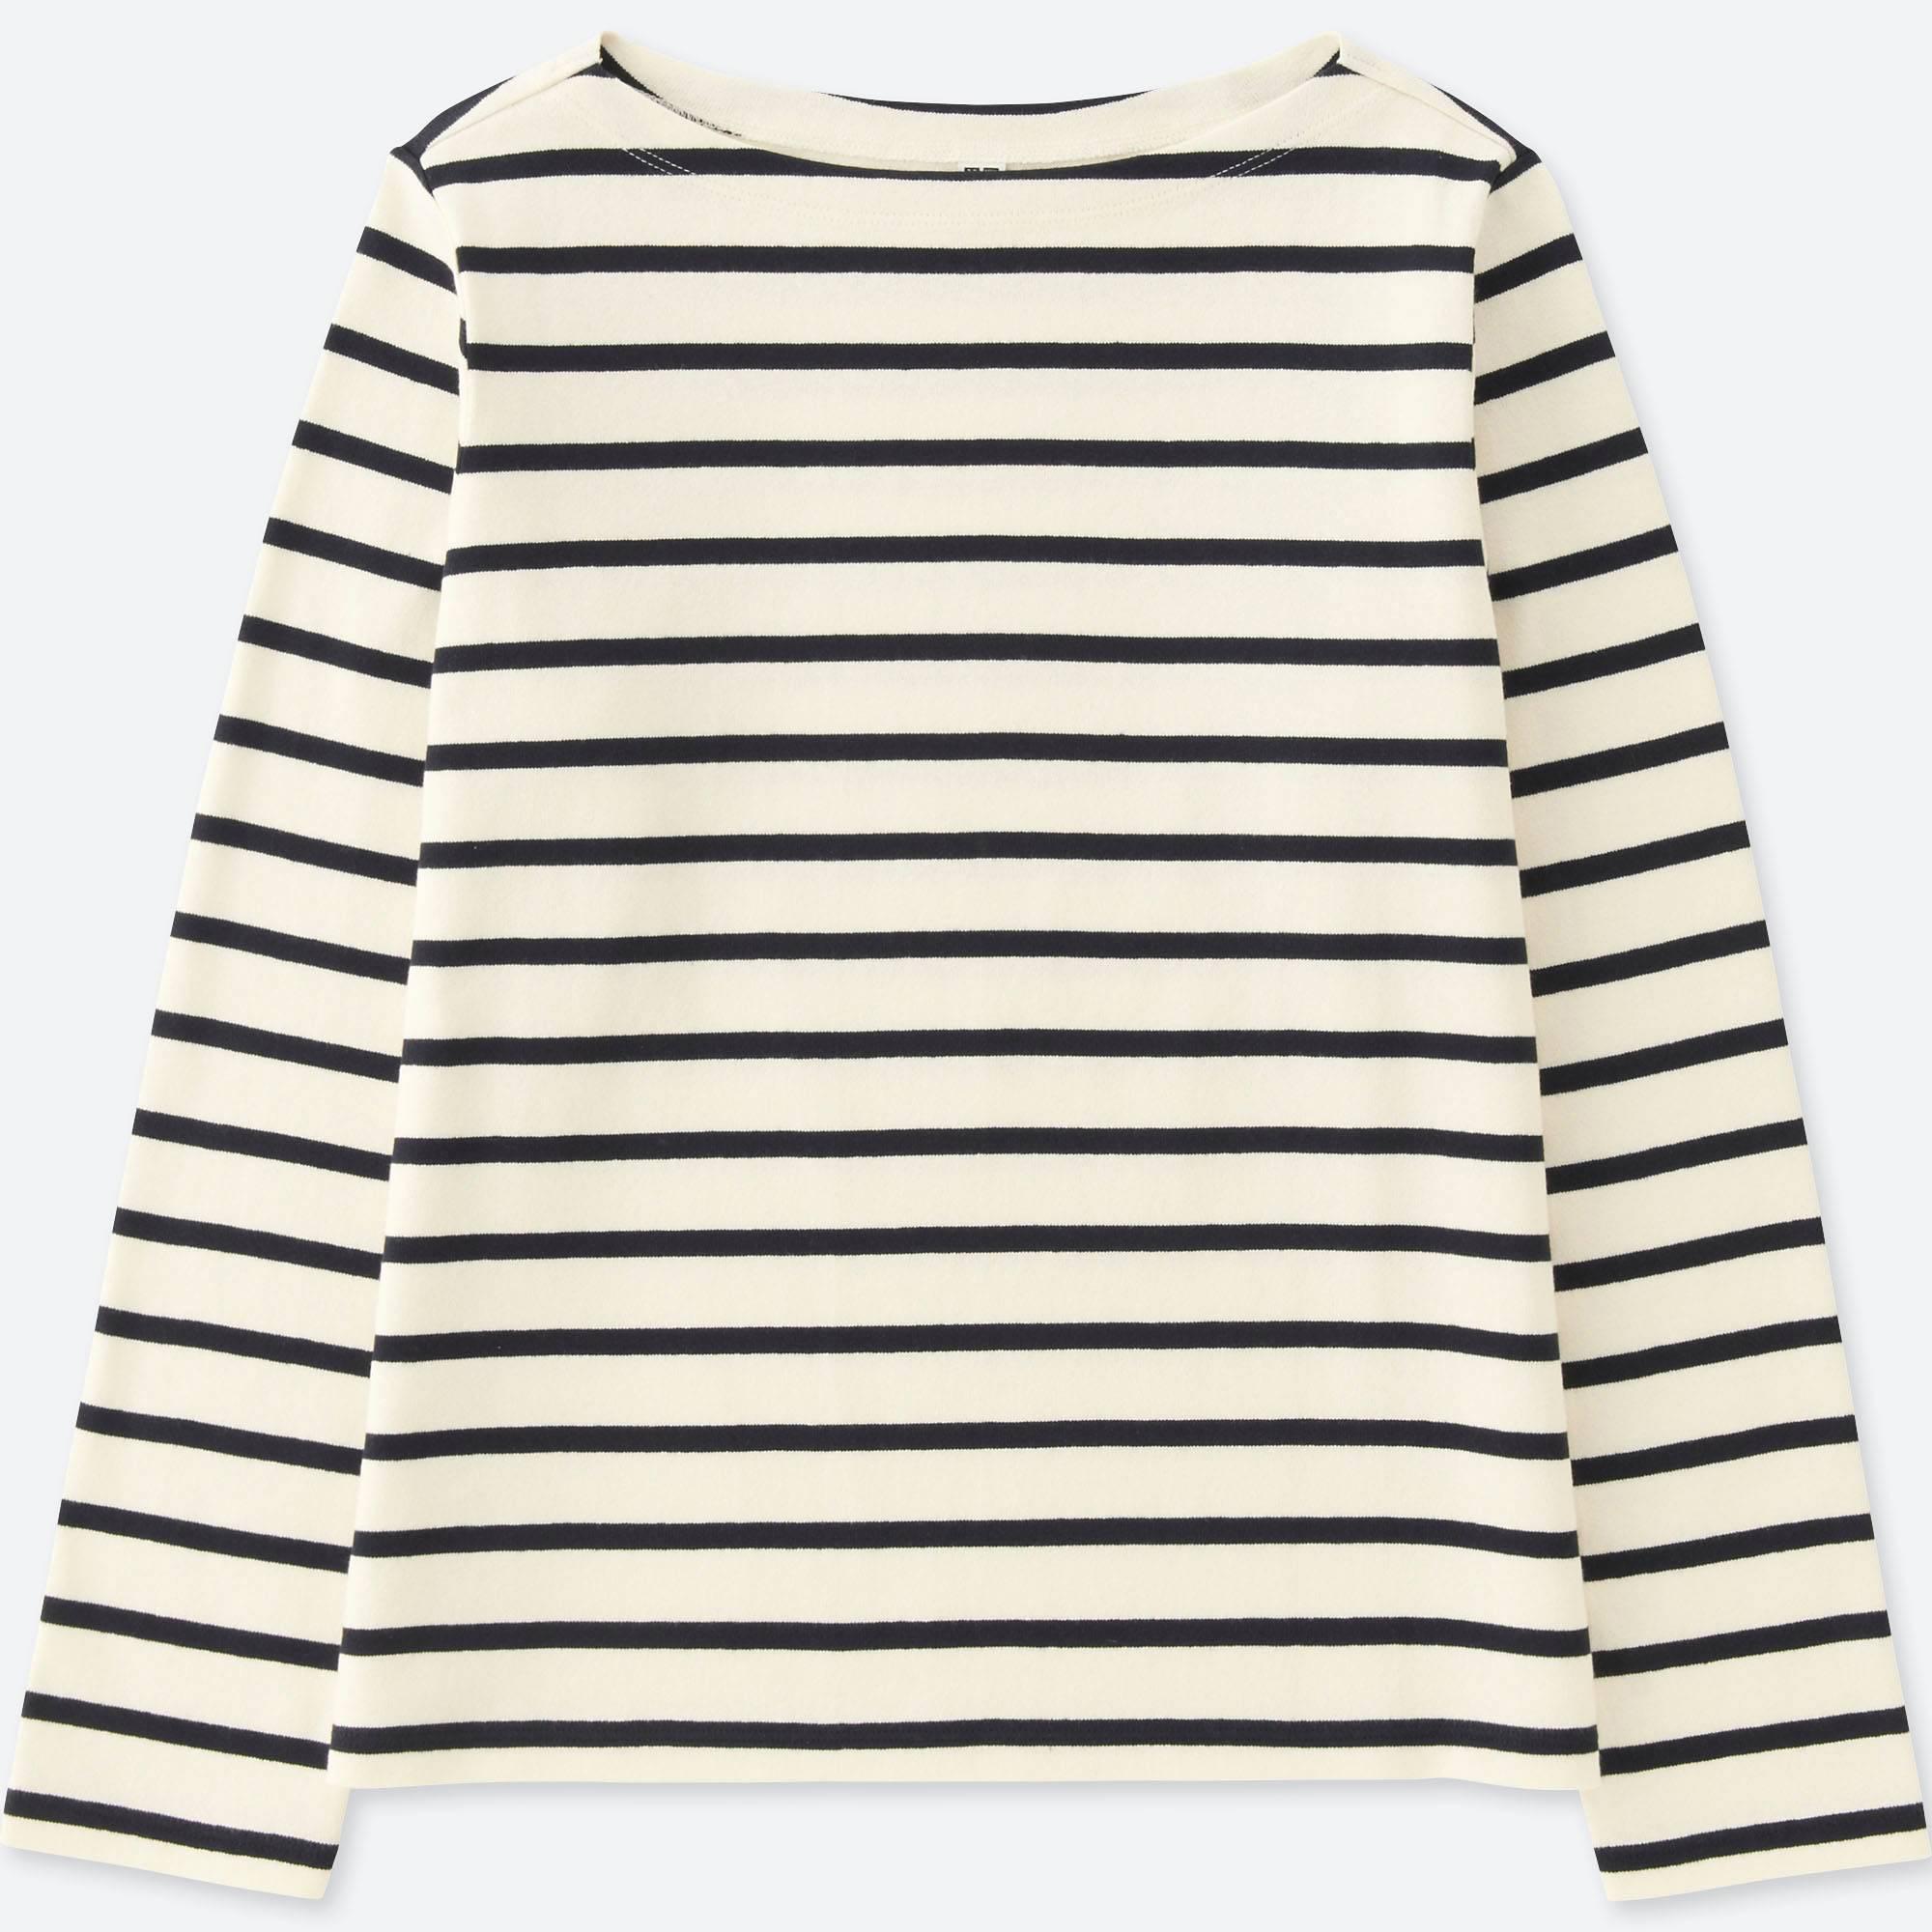 WOMEN STRIPED BOAT NECK LONG-SLEEVE T-SHIRT | UNIQLO US